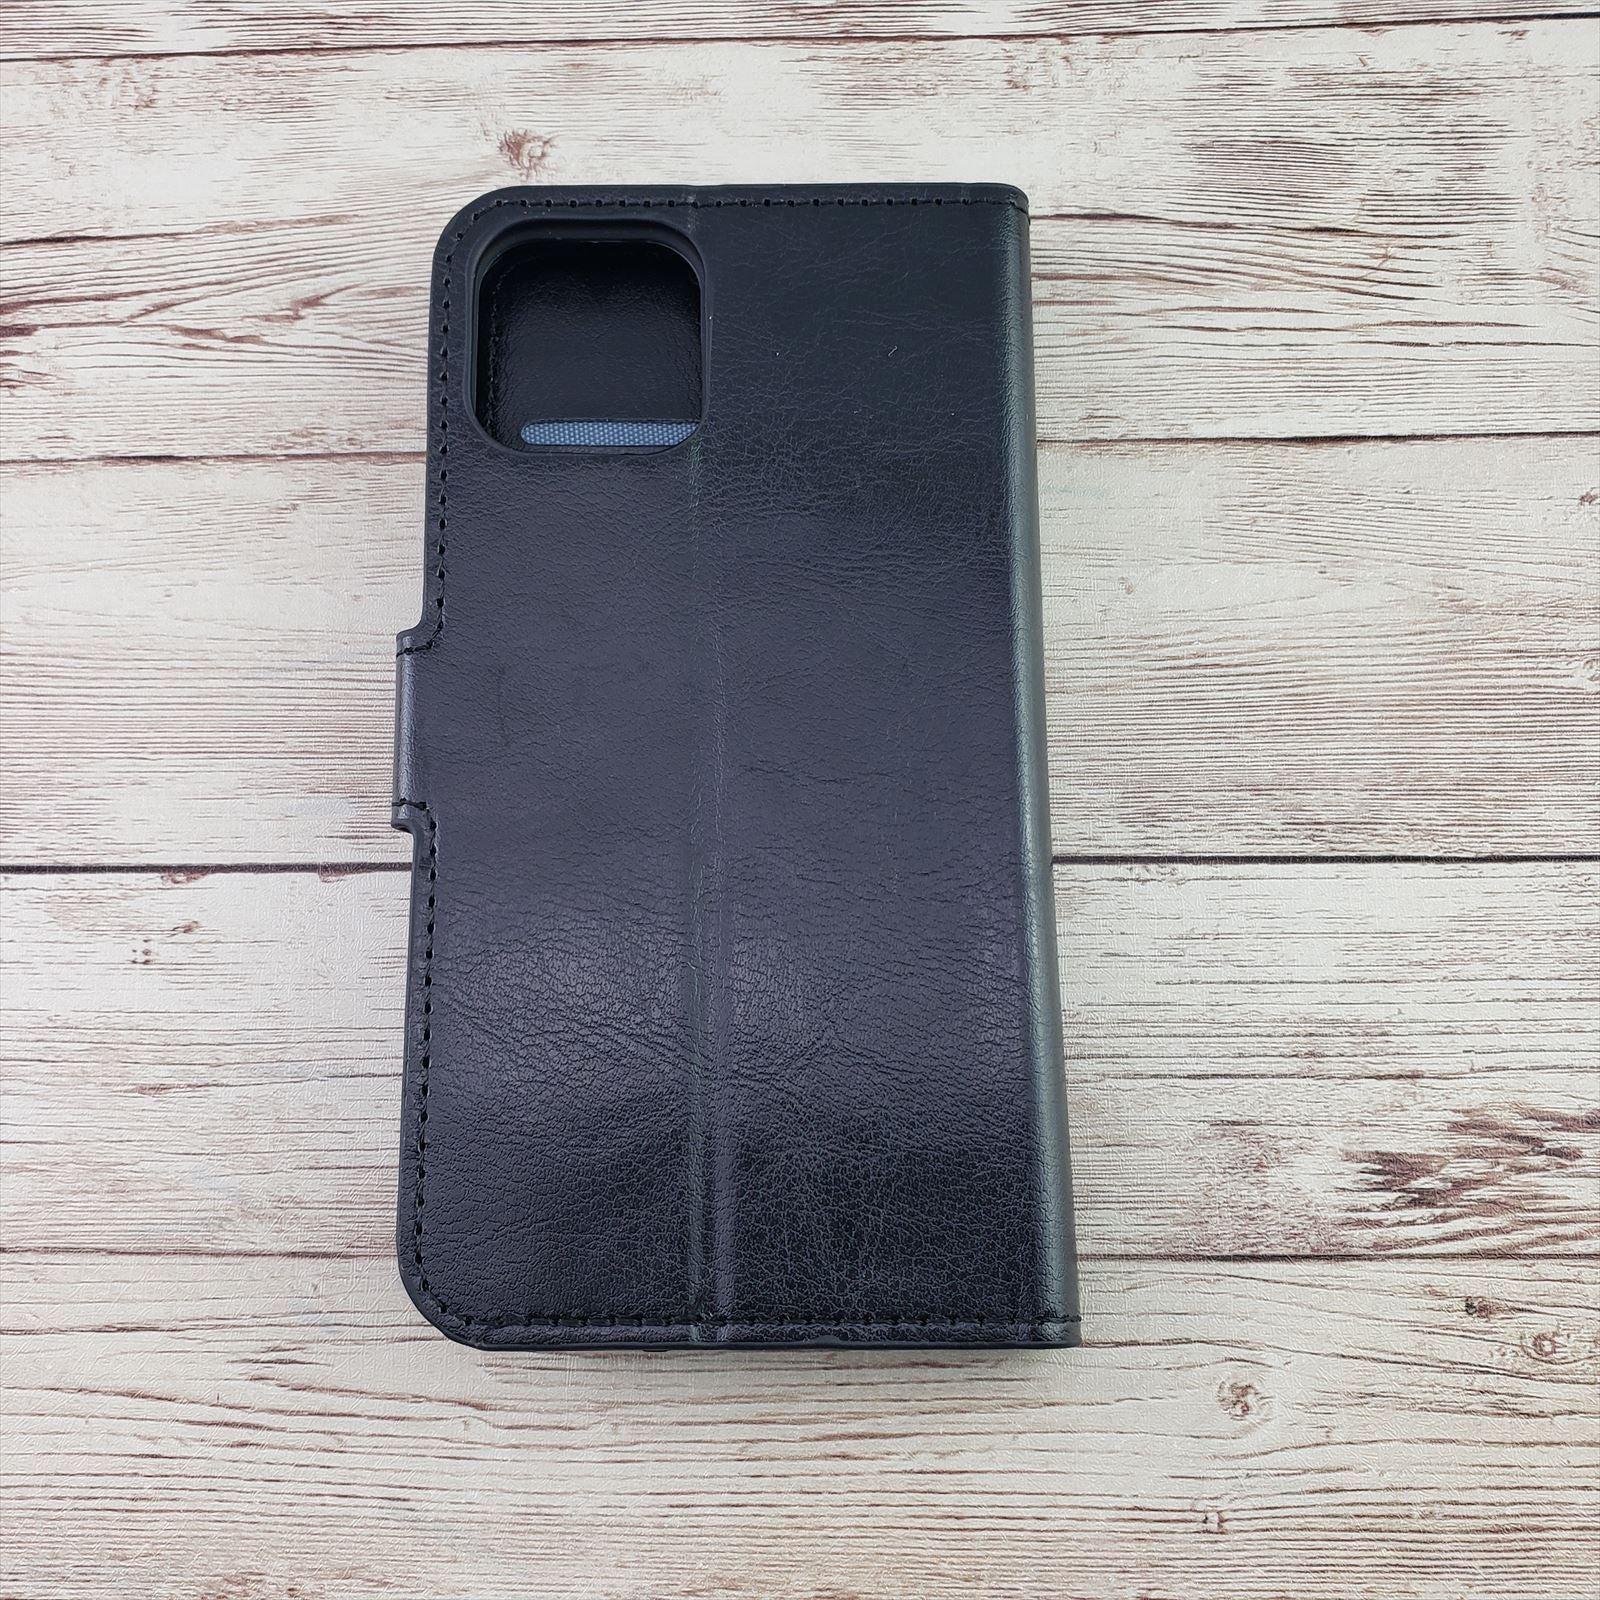 iPhone 12 Black Wallet Case